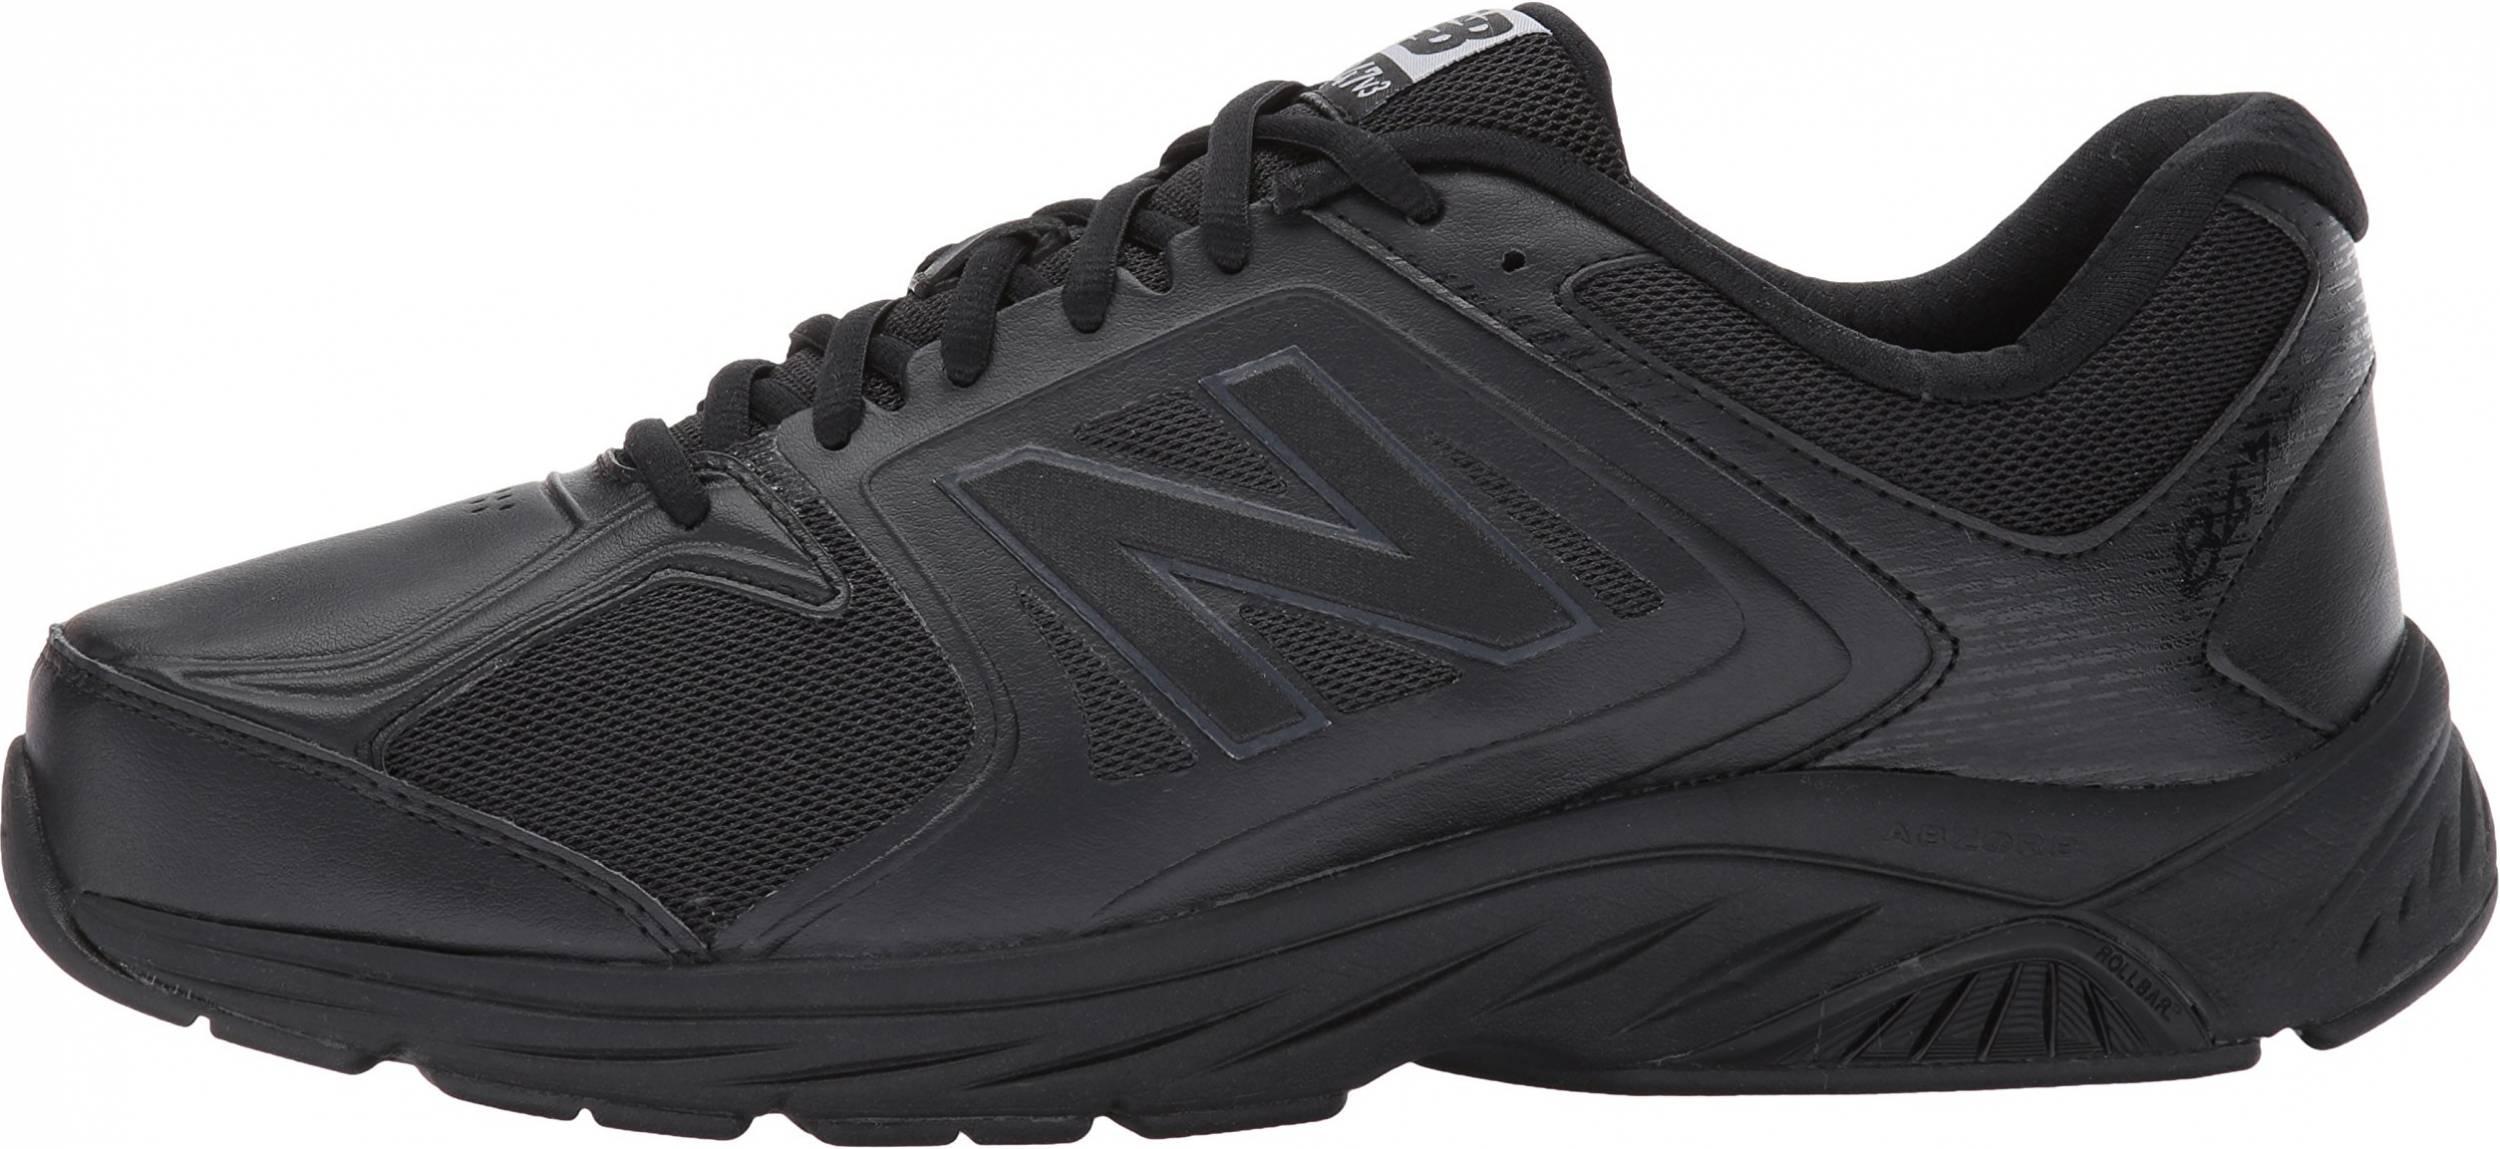 Save 35% on New Balance Walking Shoes